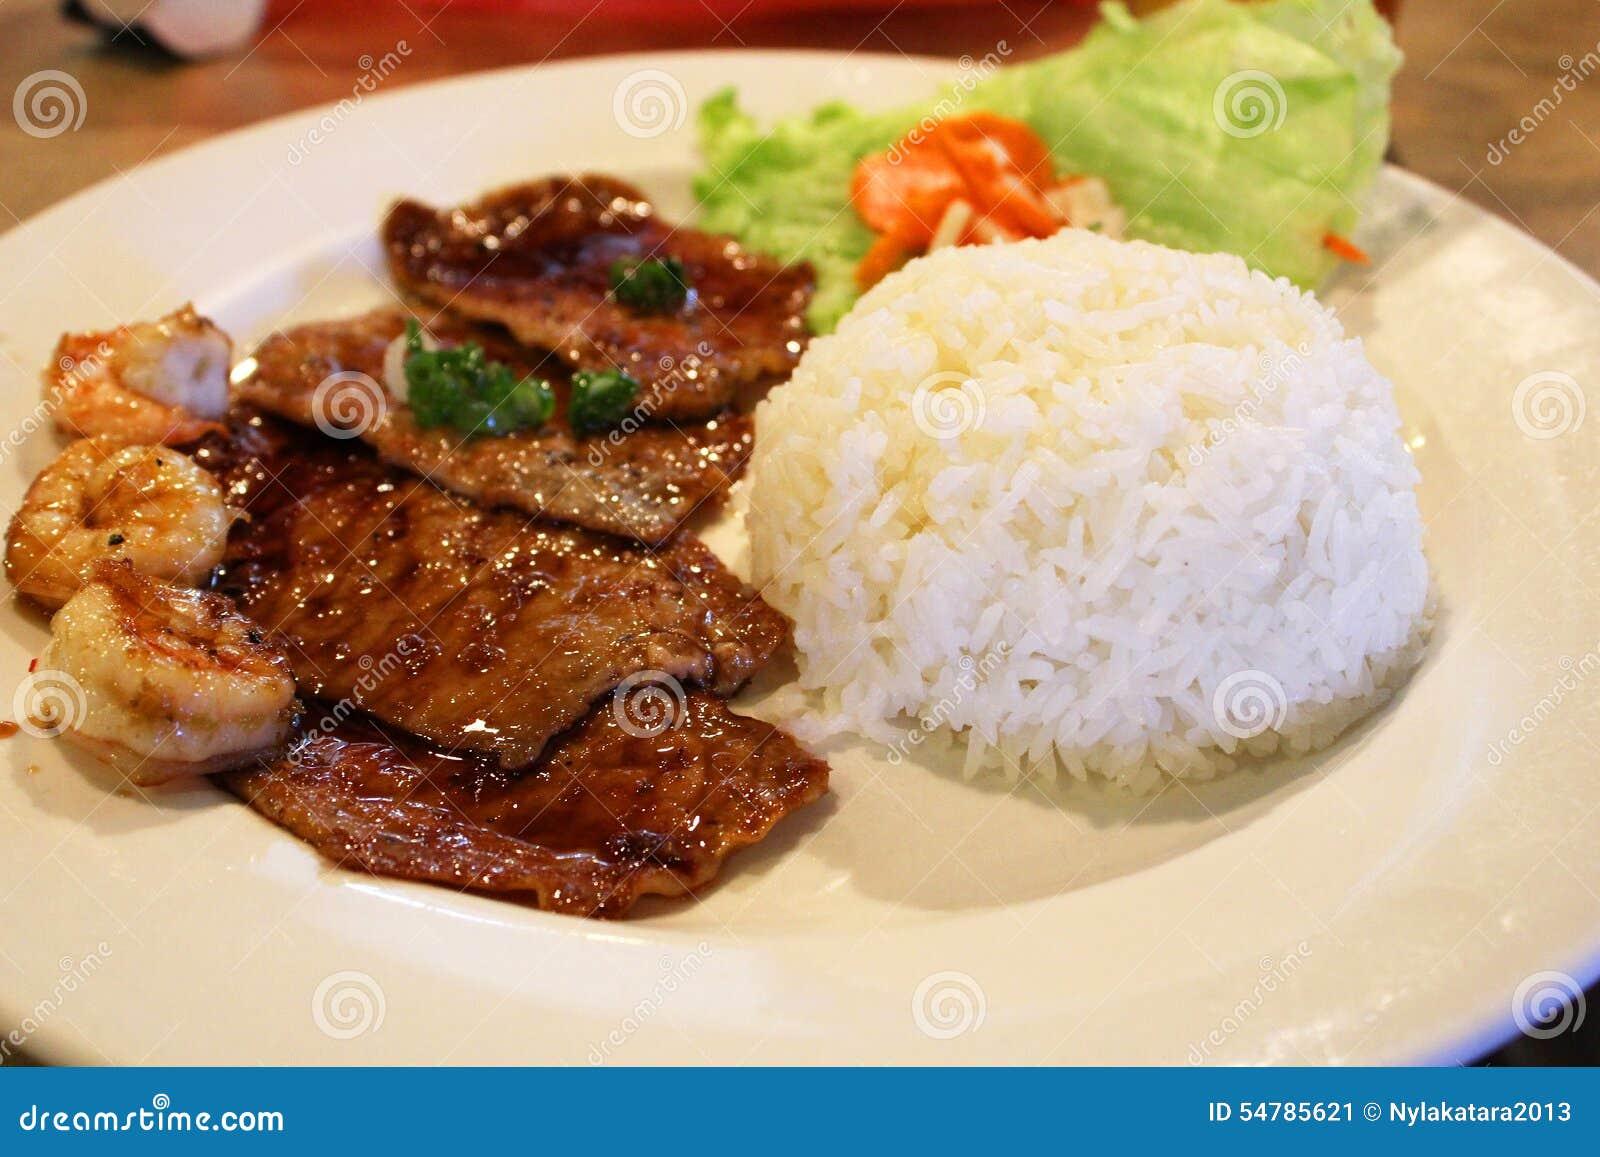 cuisine vietnamienne photo stock image 54785621. Black Bedroom Furniture Sets. Home Design Ideas